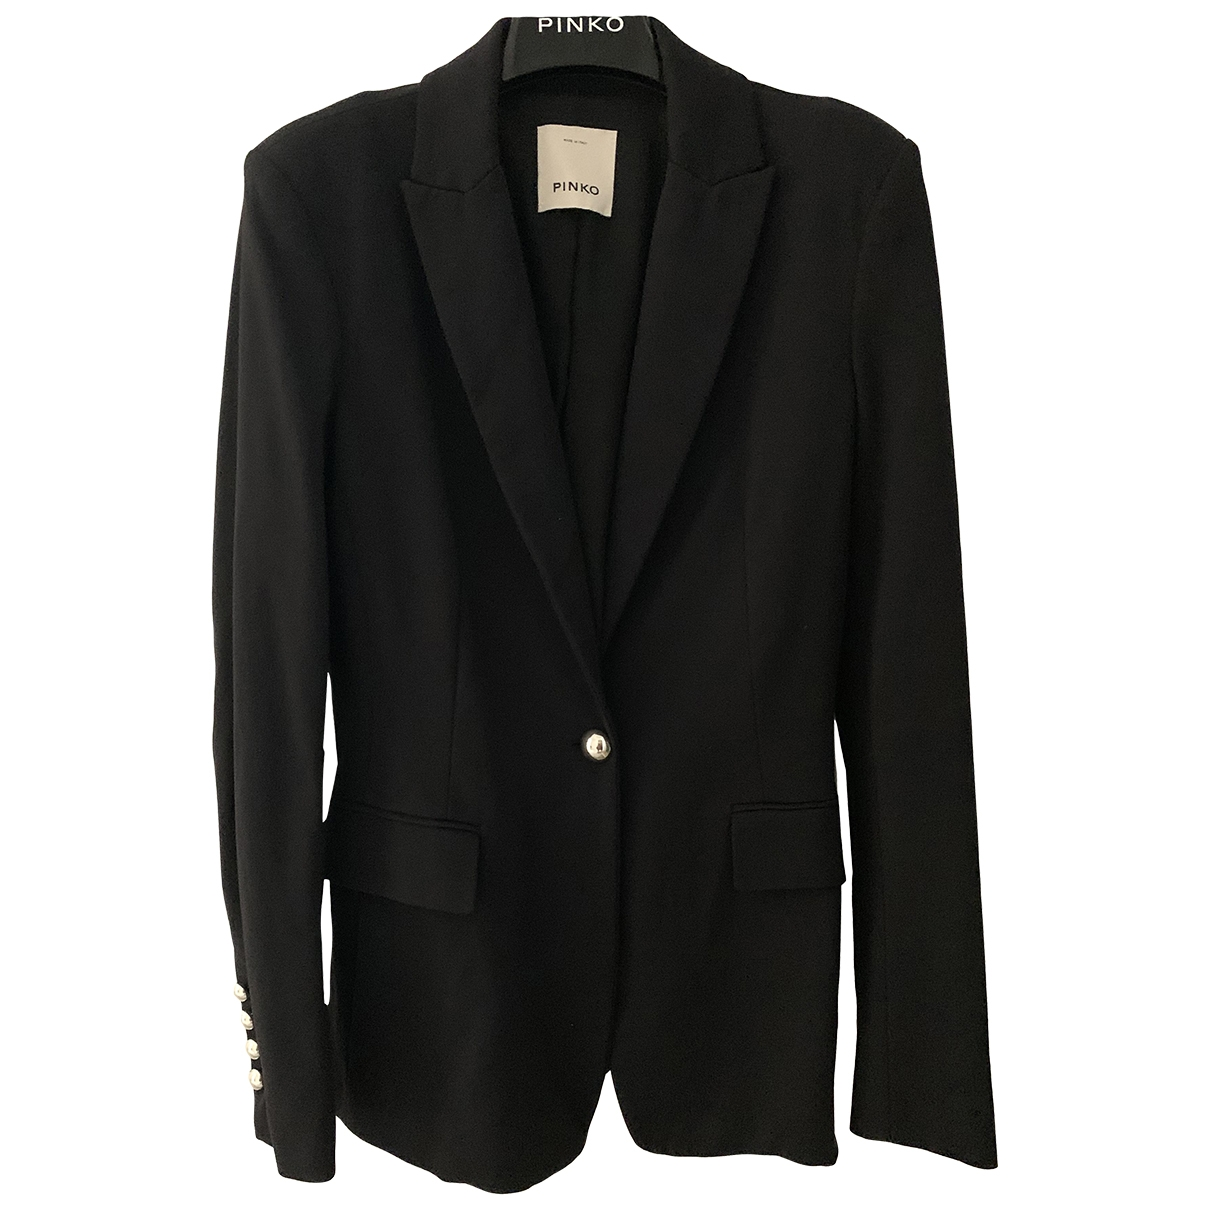 Pinko \N Black jacket for Women XS International